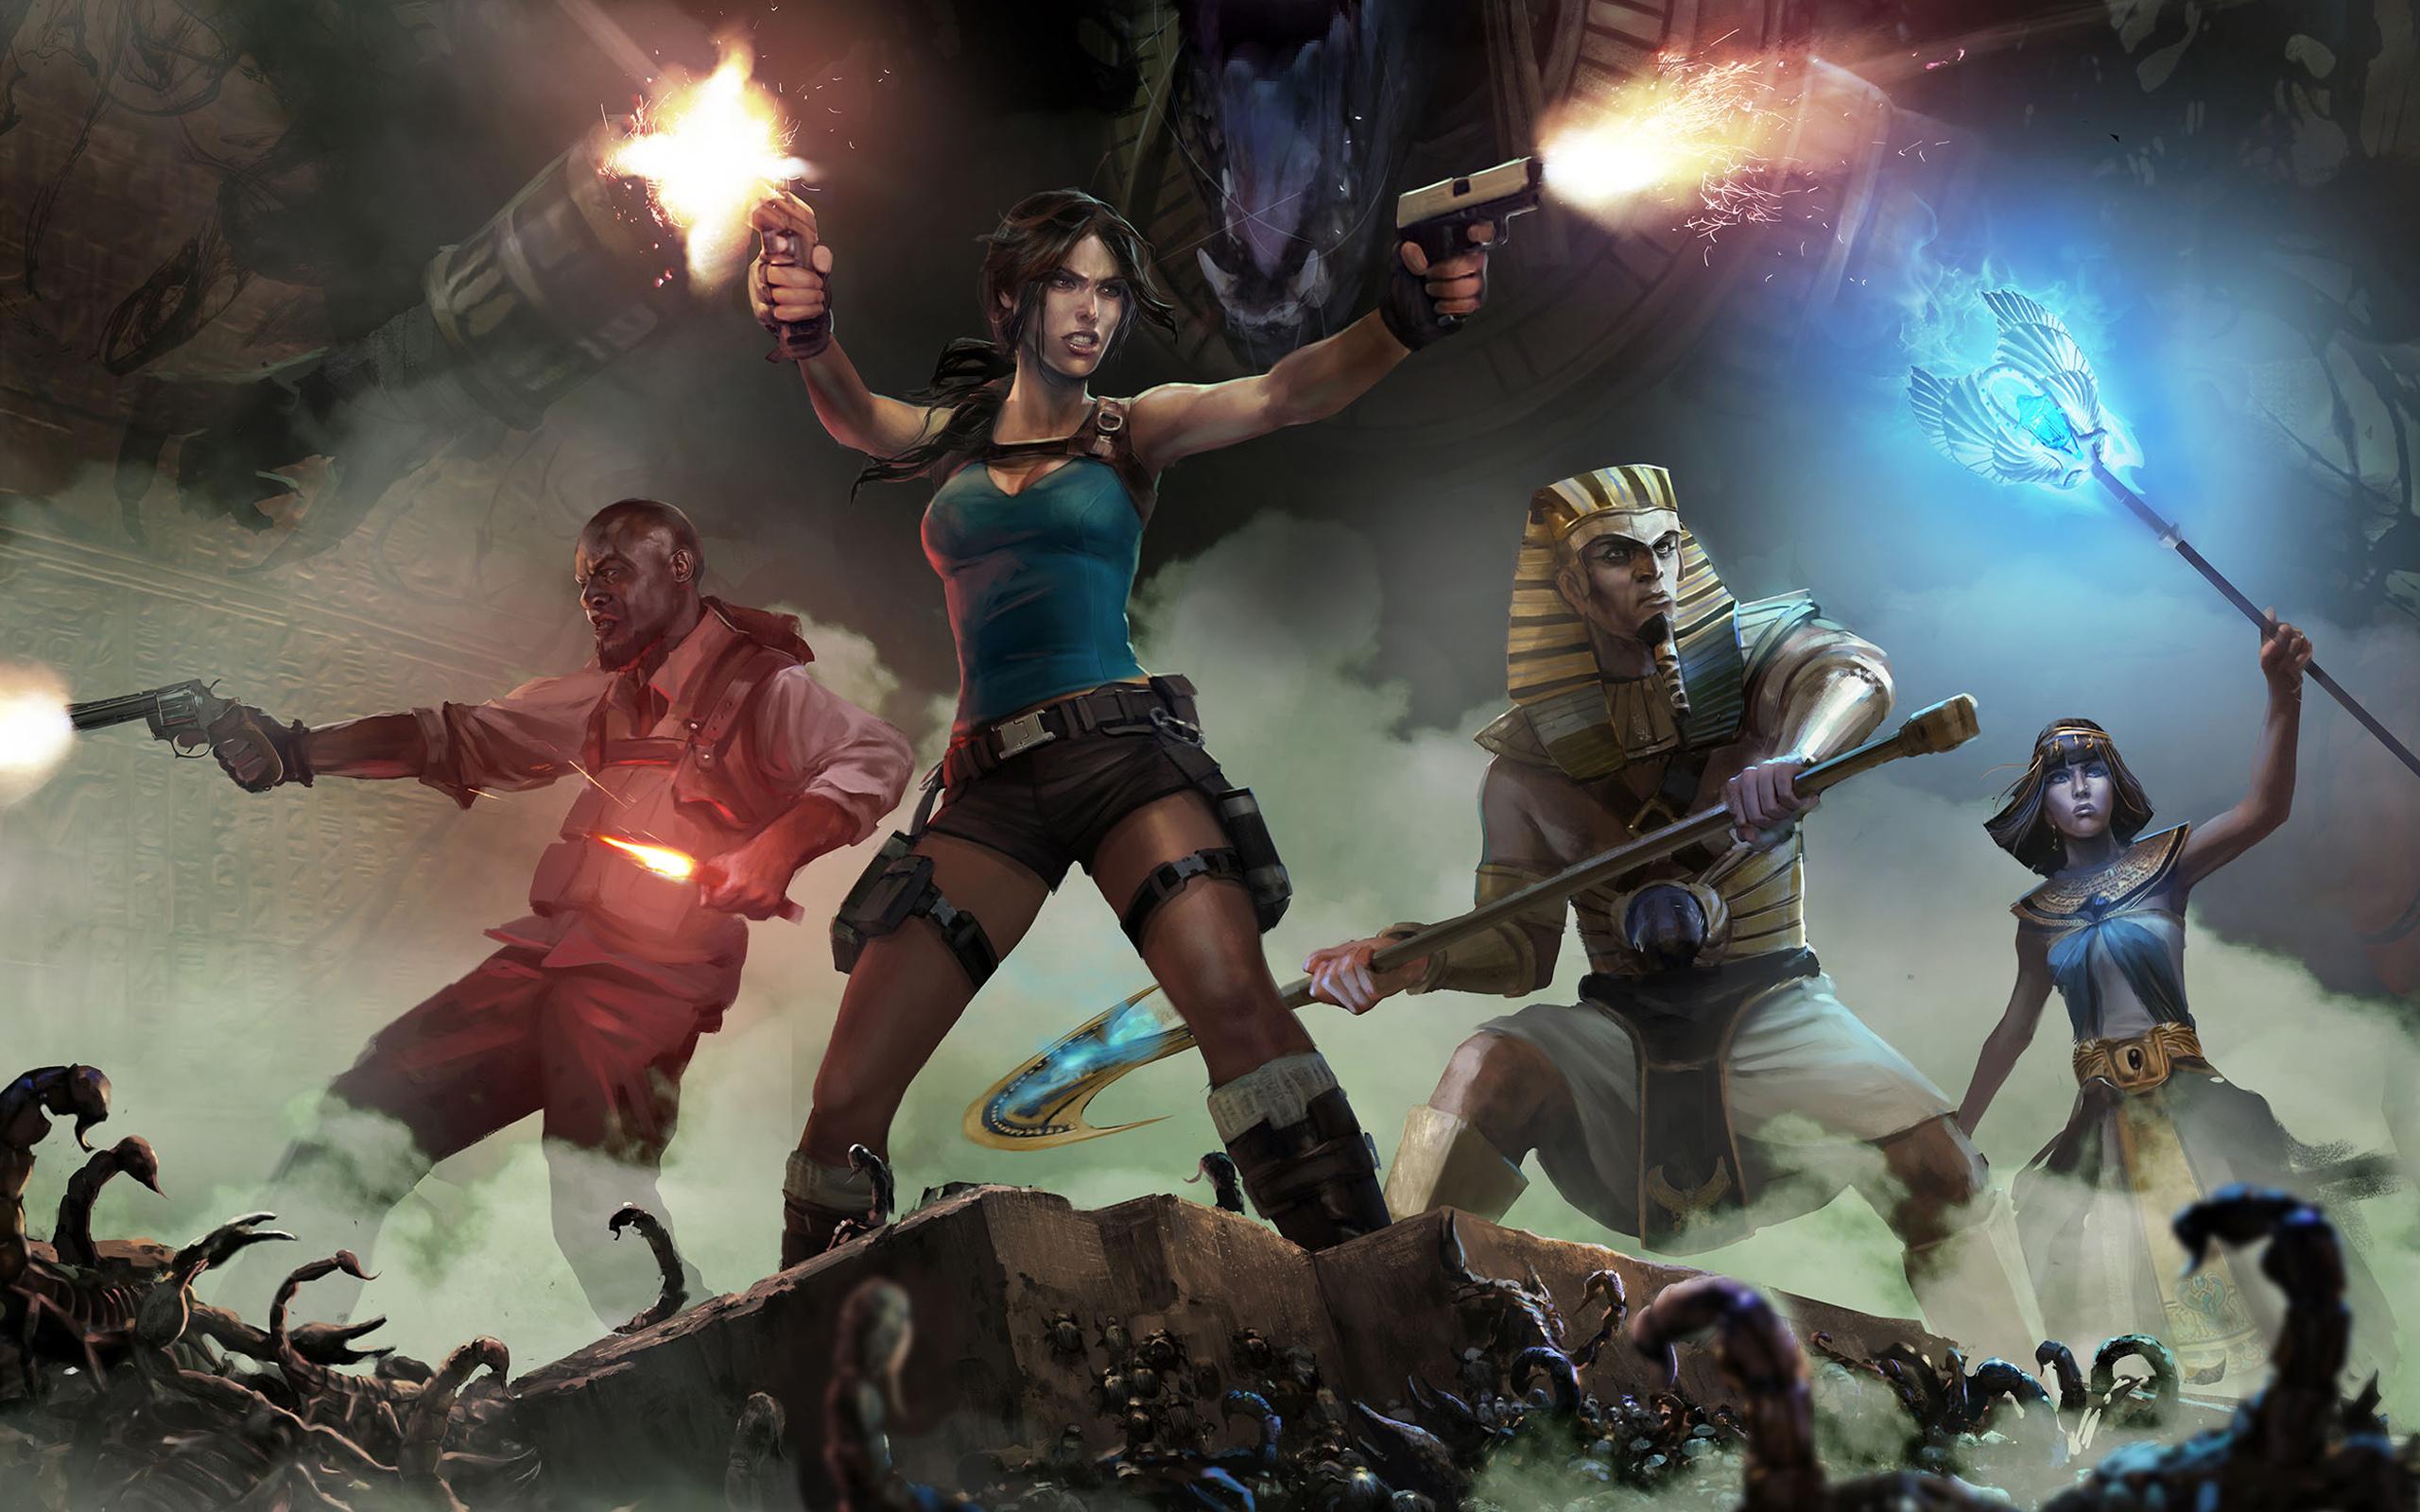 7680x4320 Lara Croft 8k Artwork 8k Hd 4k Wallpapers: Temple Wallpapers, Photos And Desktop Backgrounds Up To 8K